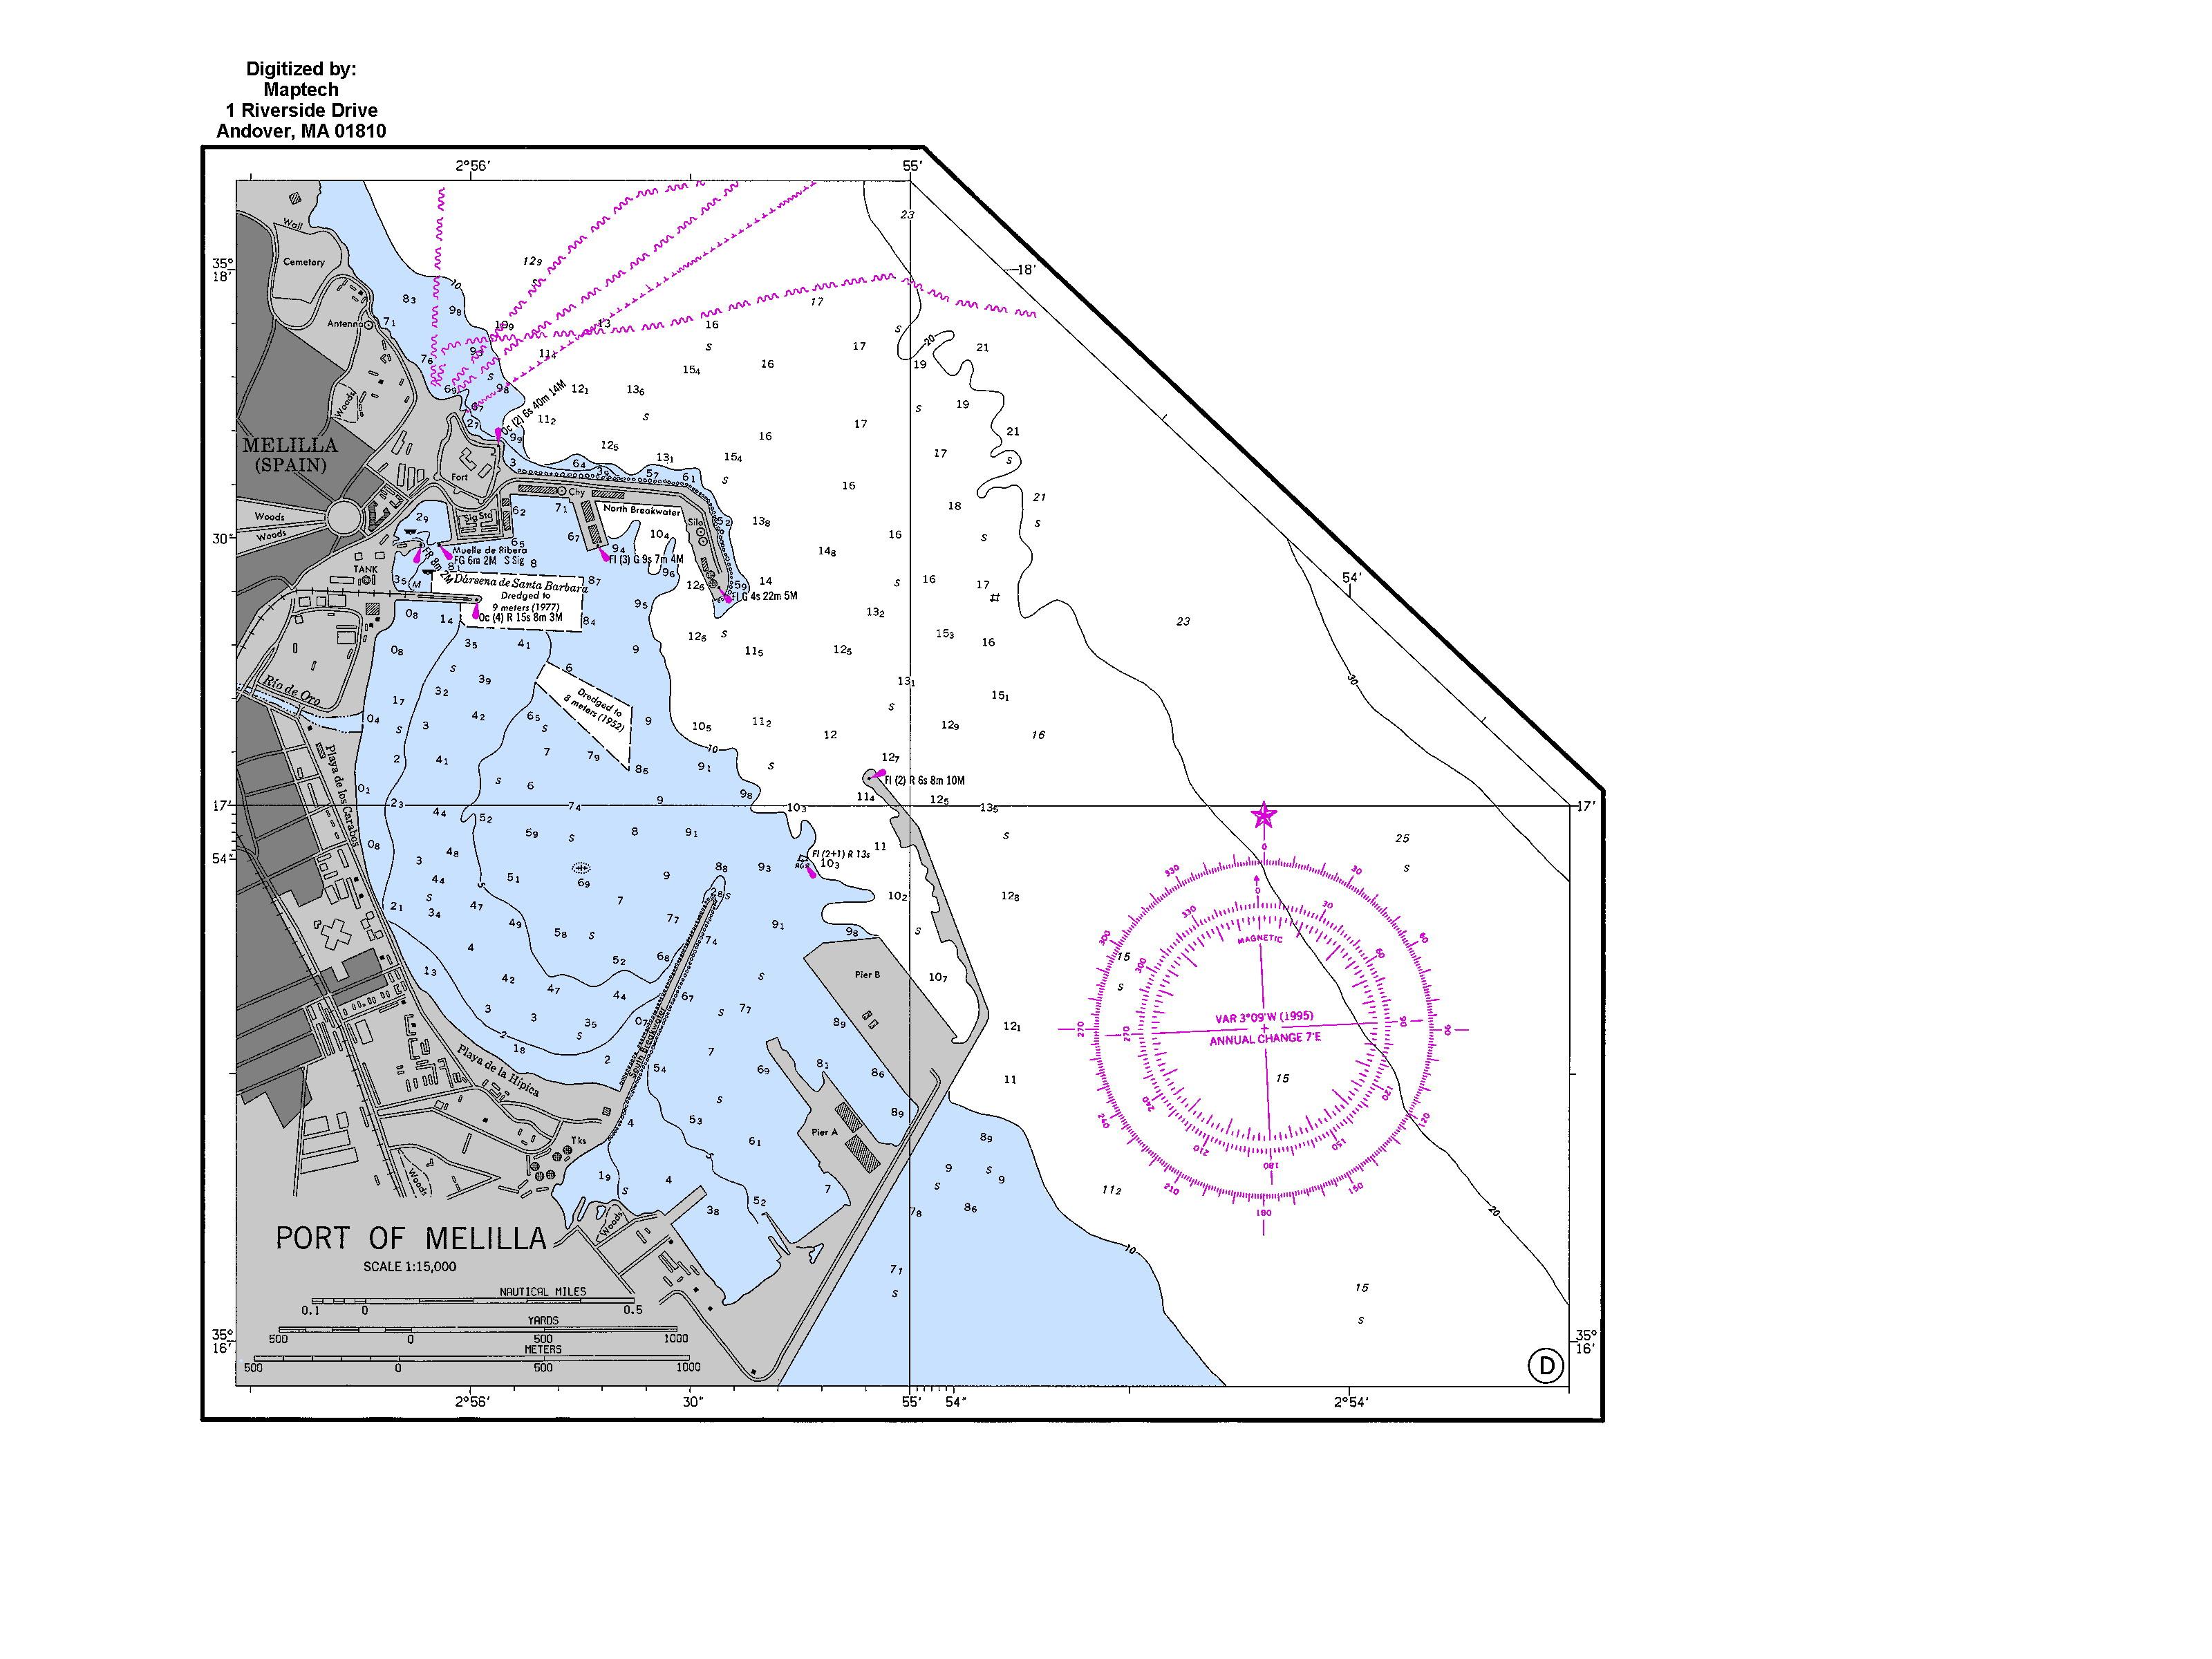 Port of Melilla nautical chart